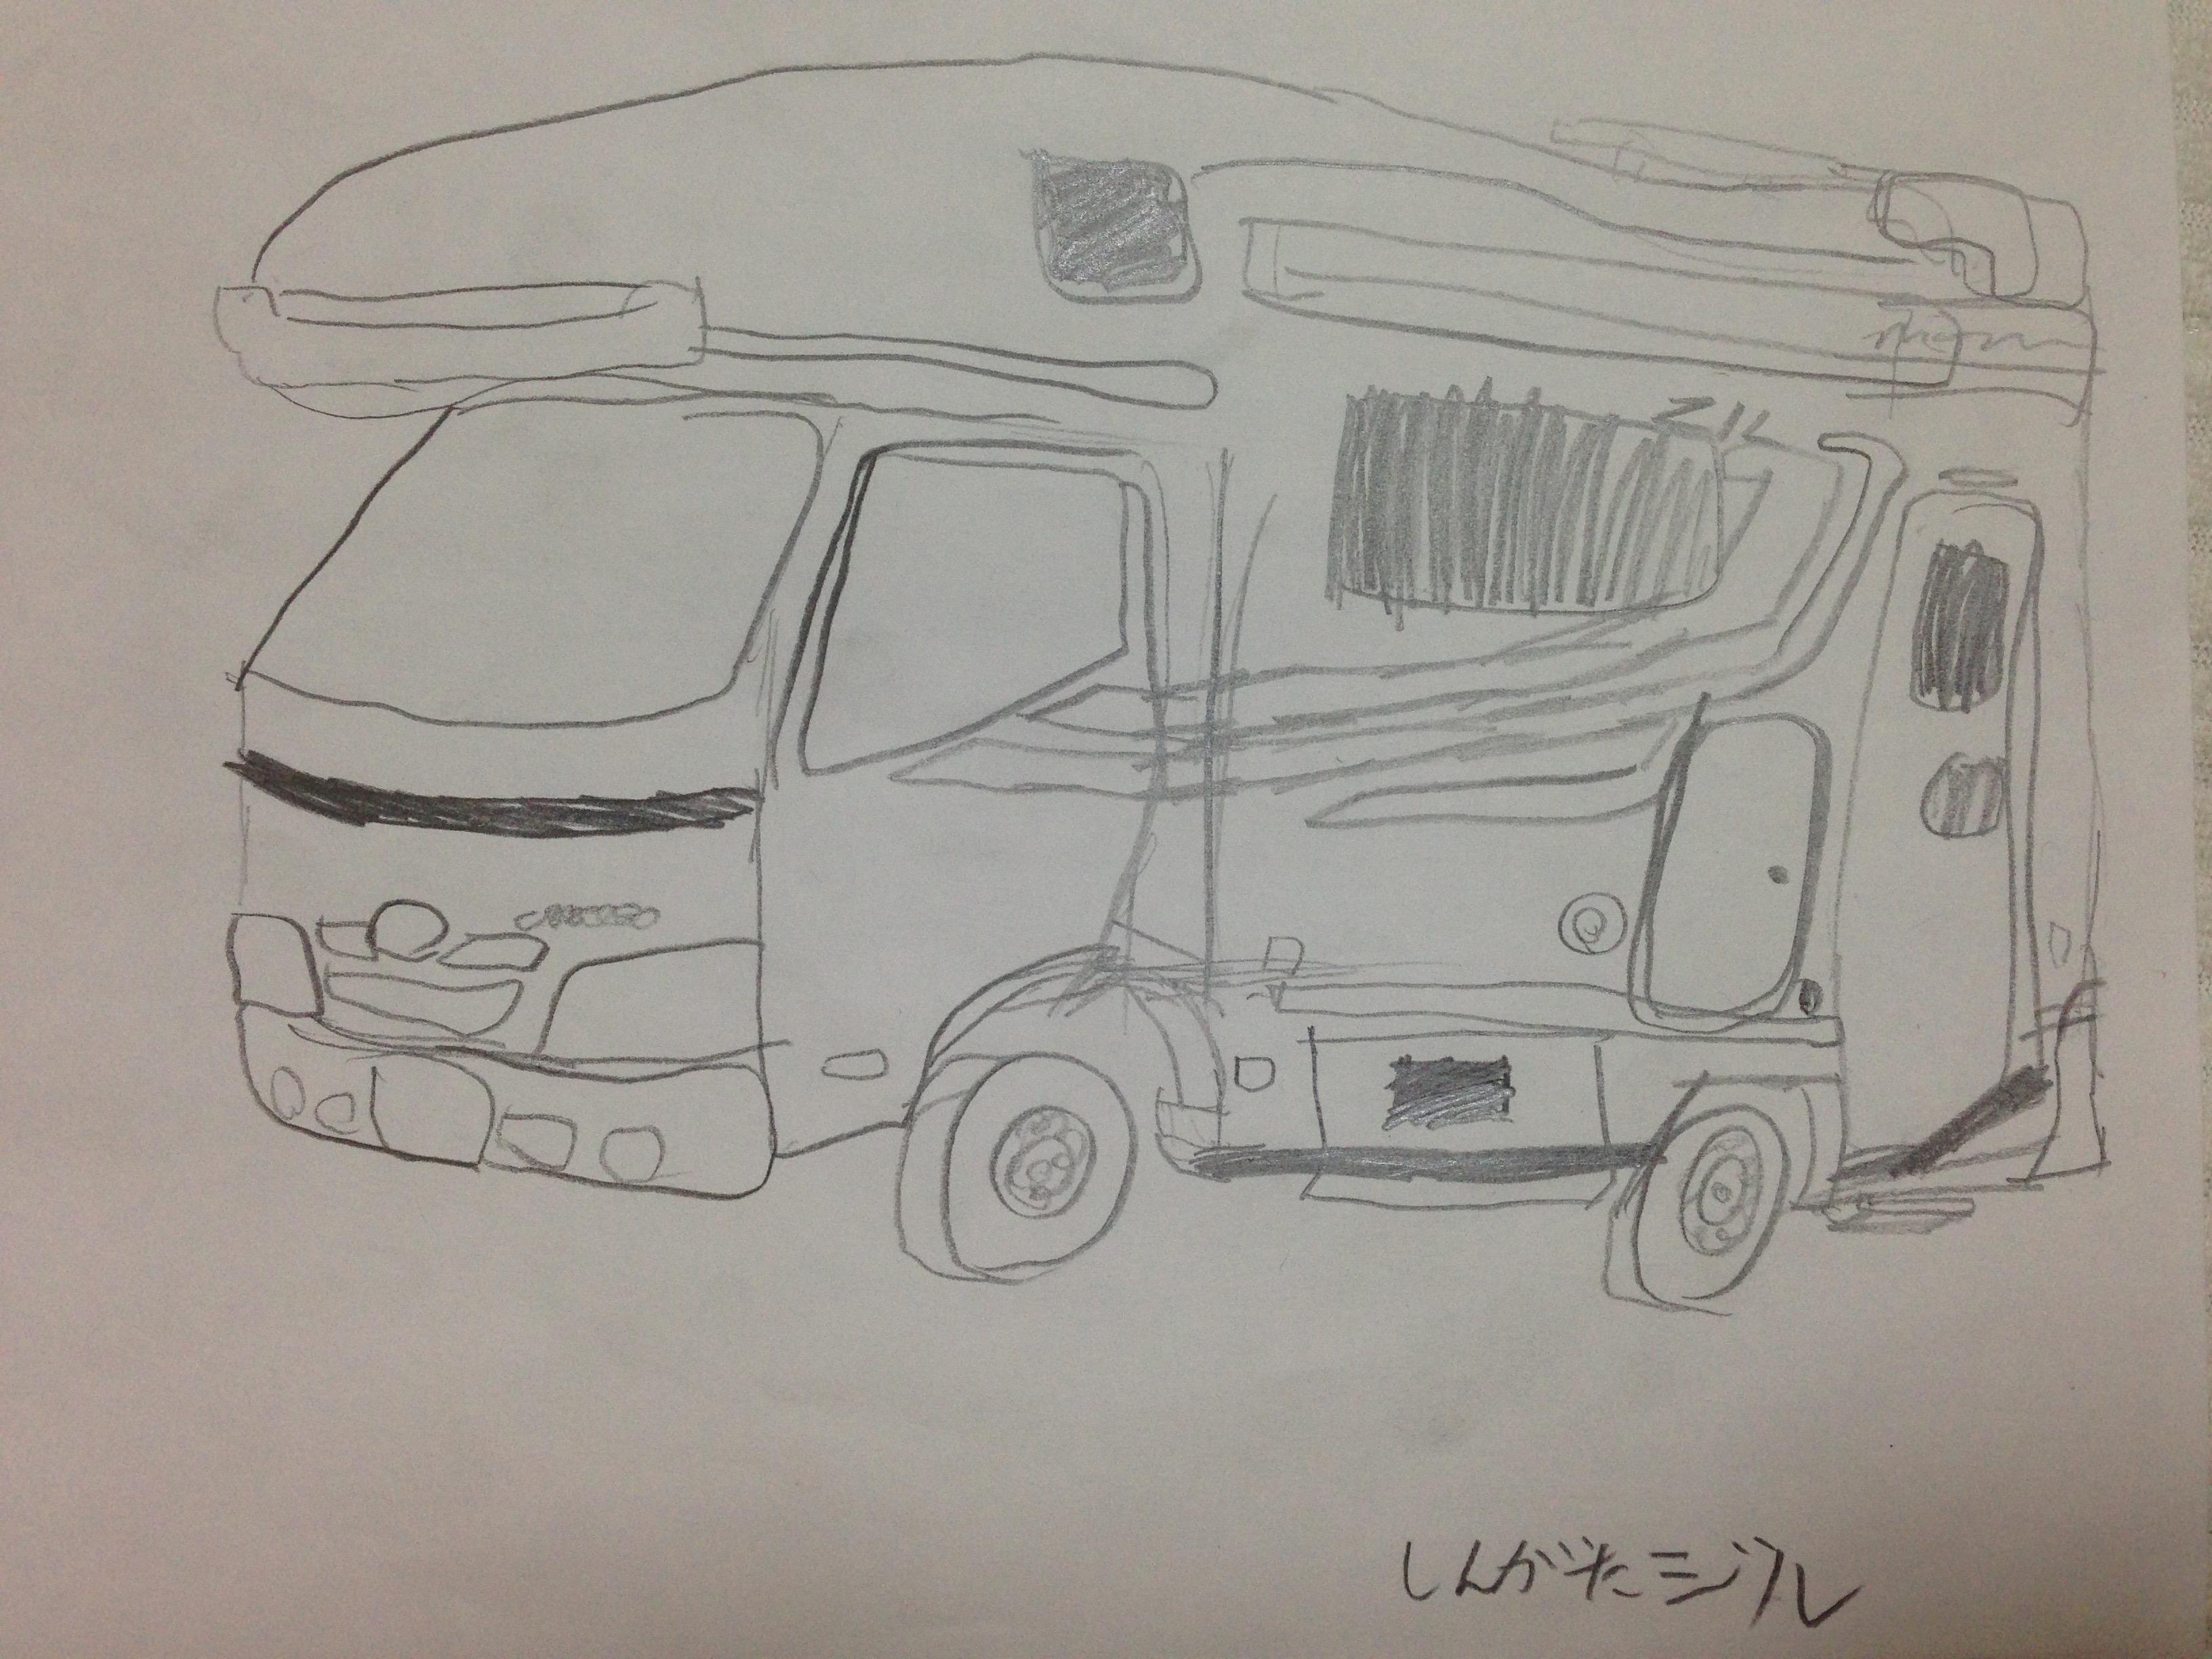 http://www.vantech.jp/shops/info/IMG_0757.jpg